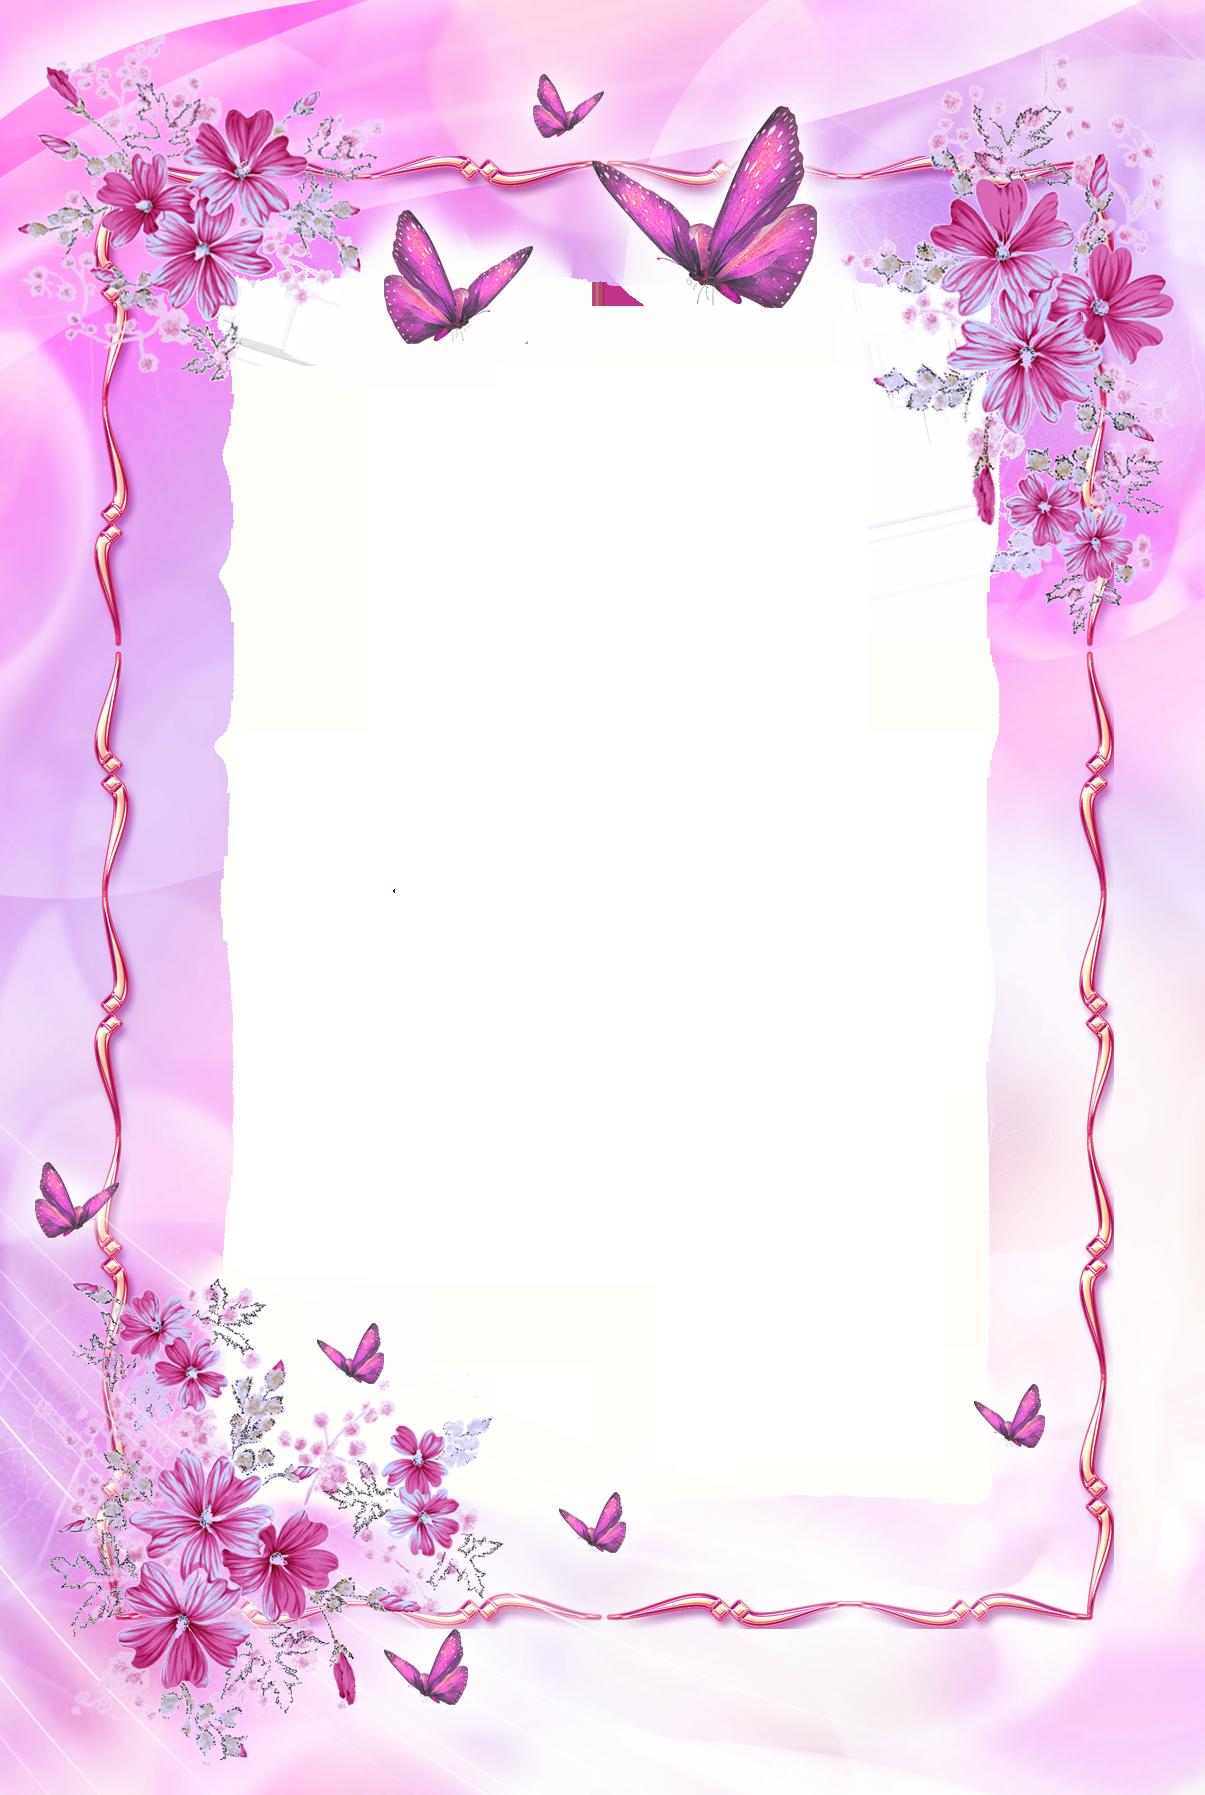 Beautiful Pink Transparent Frame with Butterflies | Frames ...